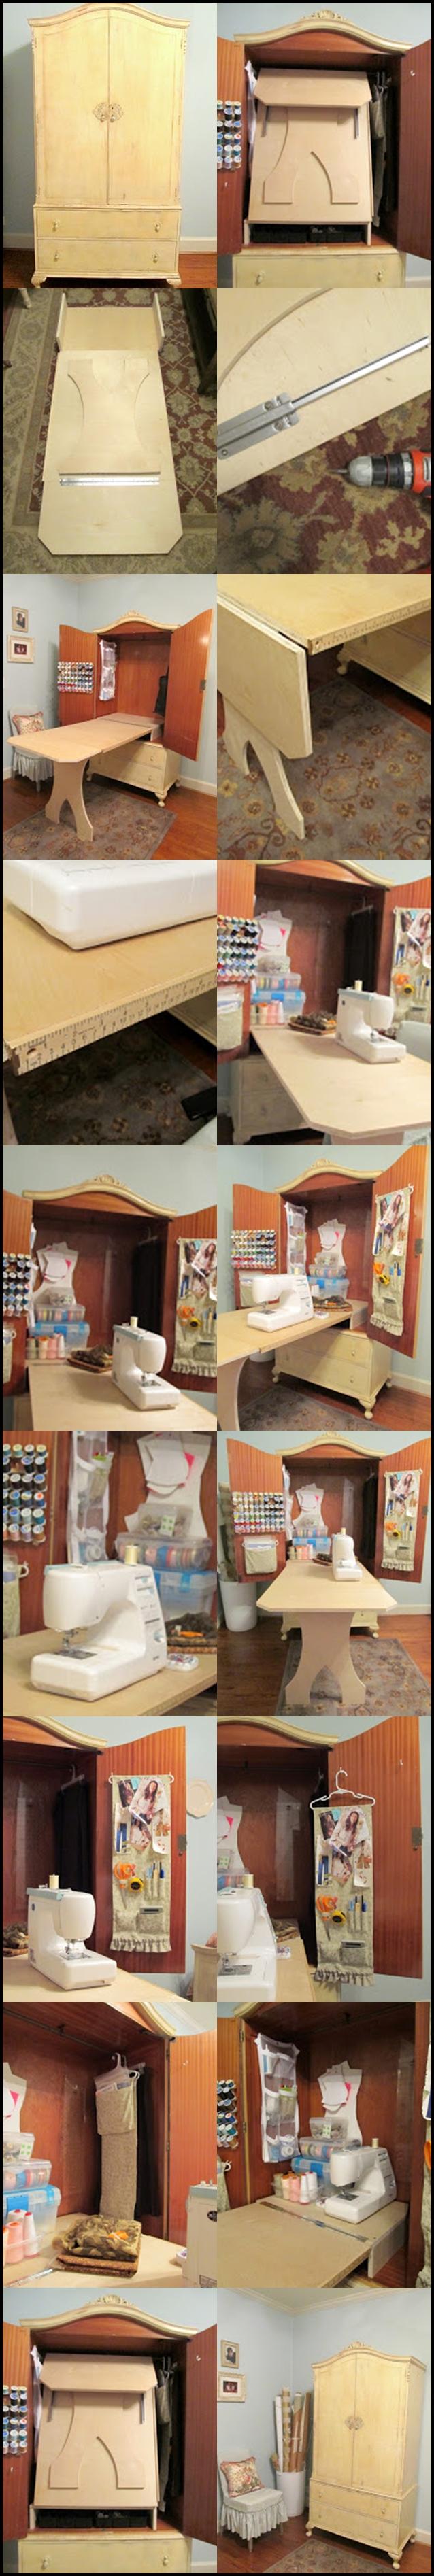 Sewing Cabinet m Wonderful DIY Sewing Cabinet